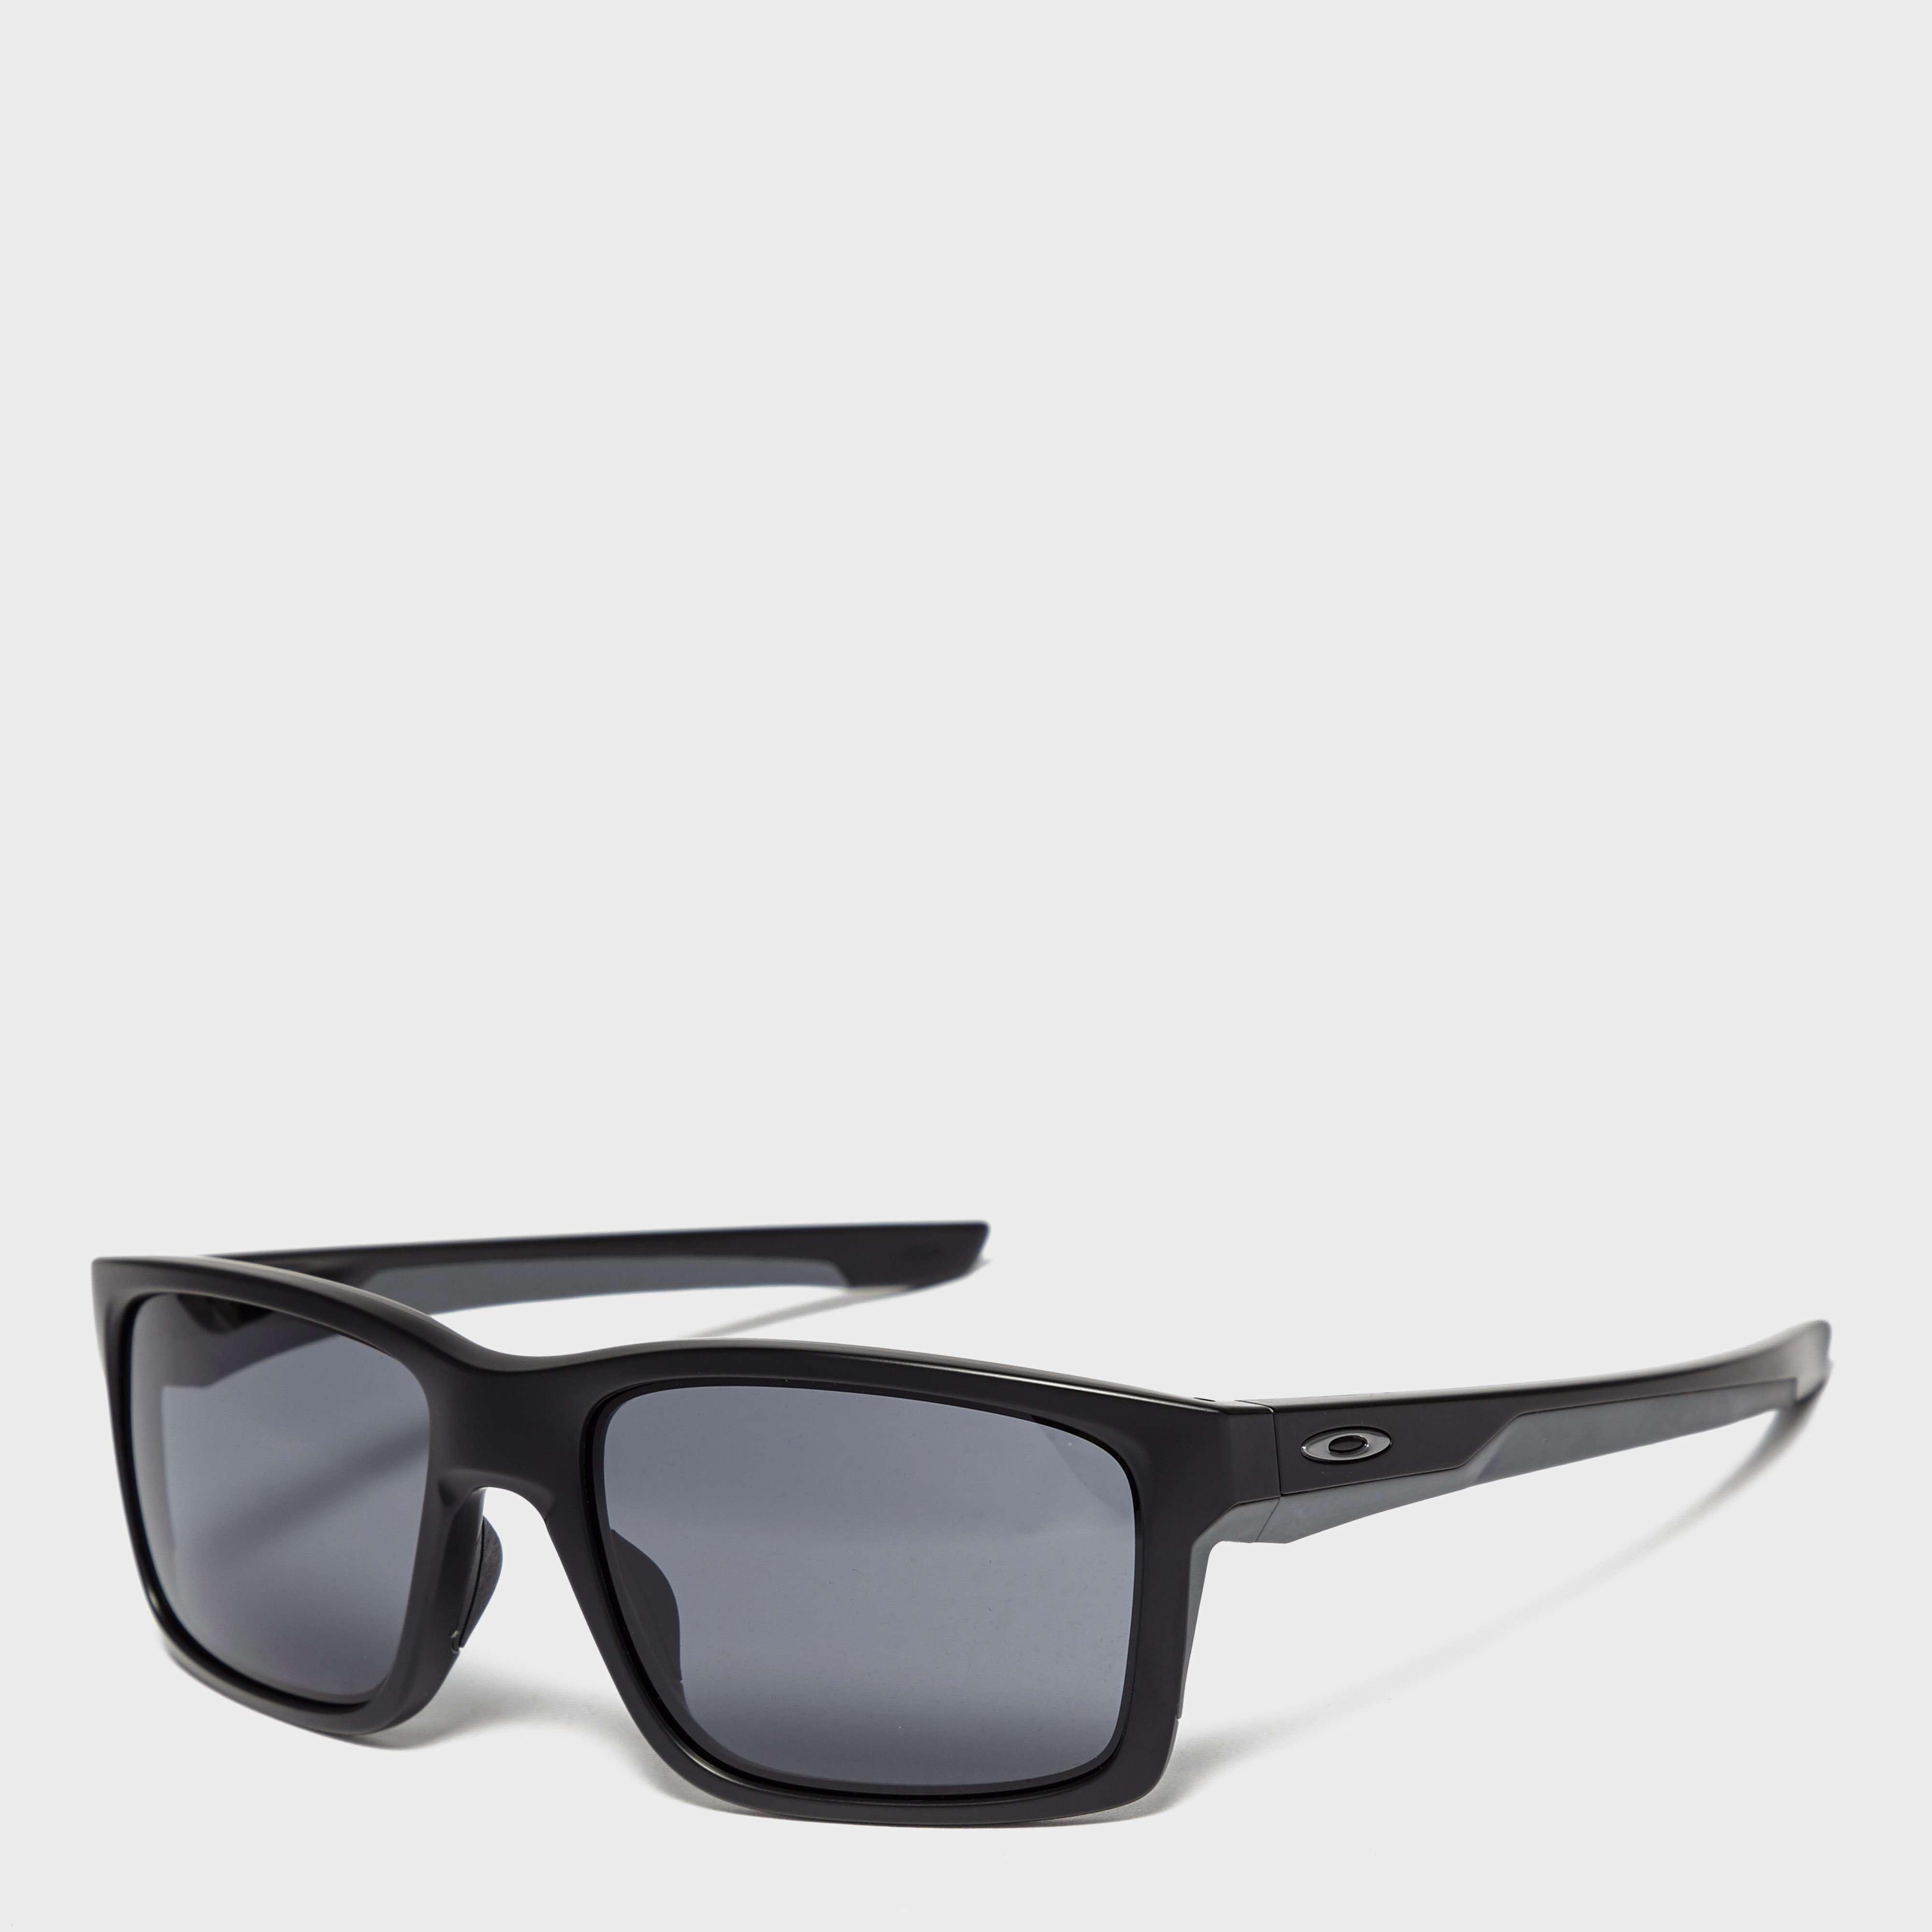 OAKLEY Mainlink™ Sunglasses